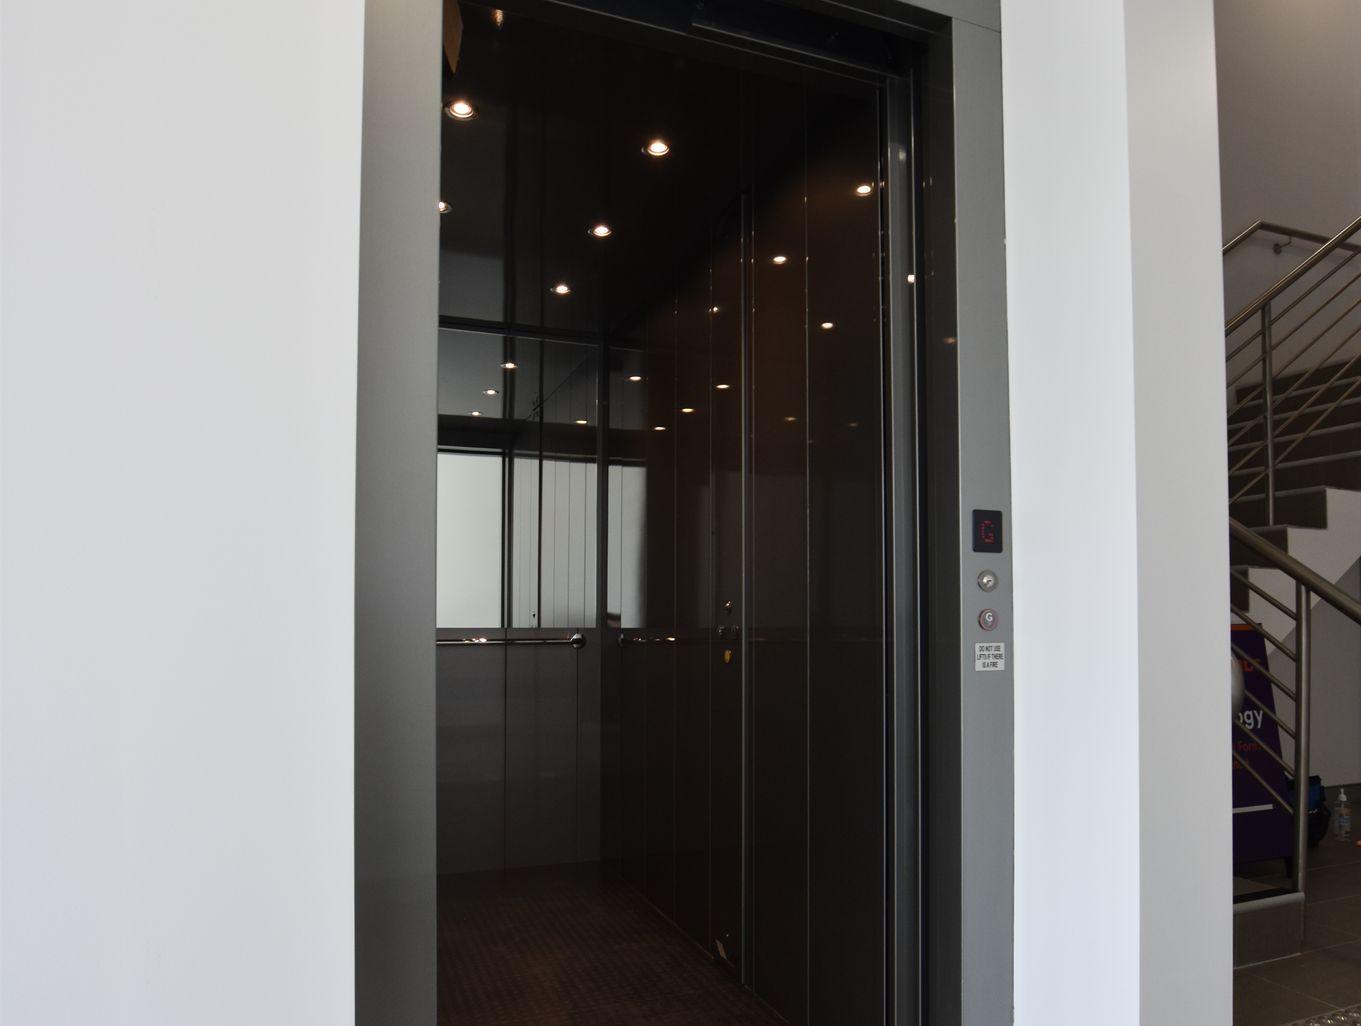 lifts for medical centers and hospitals melbourne - platinum elevators